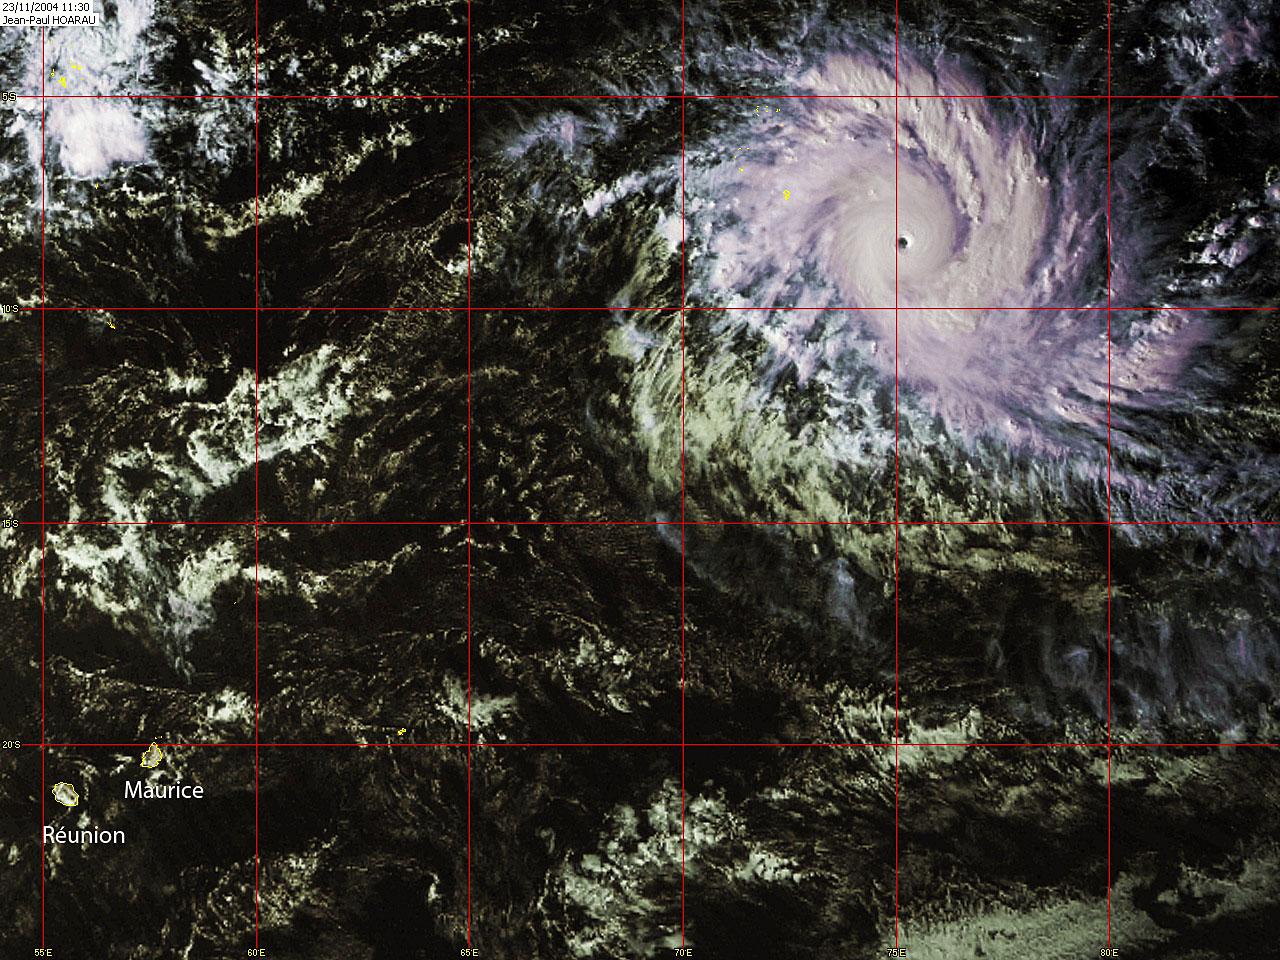 Cyclone Tropical Intense BENTO le 23/11/2004 (JP HOARAU)